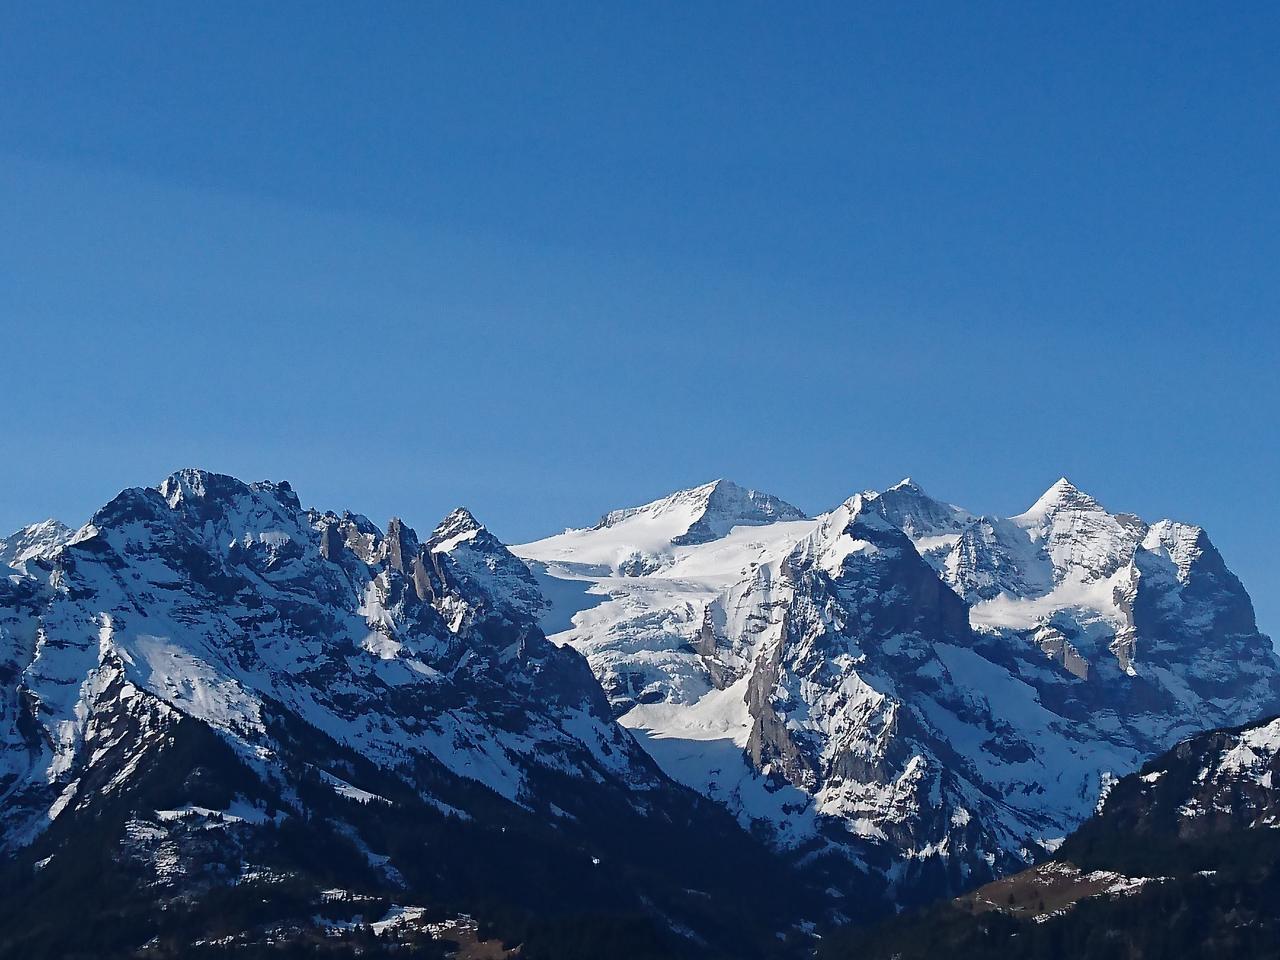 Ferienwohnung Obererli 4-Bettwohnung (2692316), Hasliberg Hohfluh, Meiringen - Hasliberg, Berner Oberland, Schweiz, Bild 13